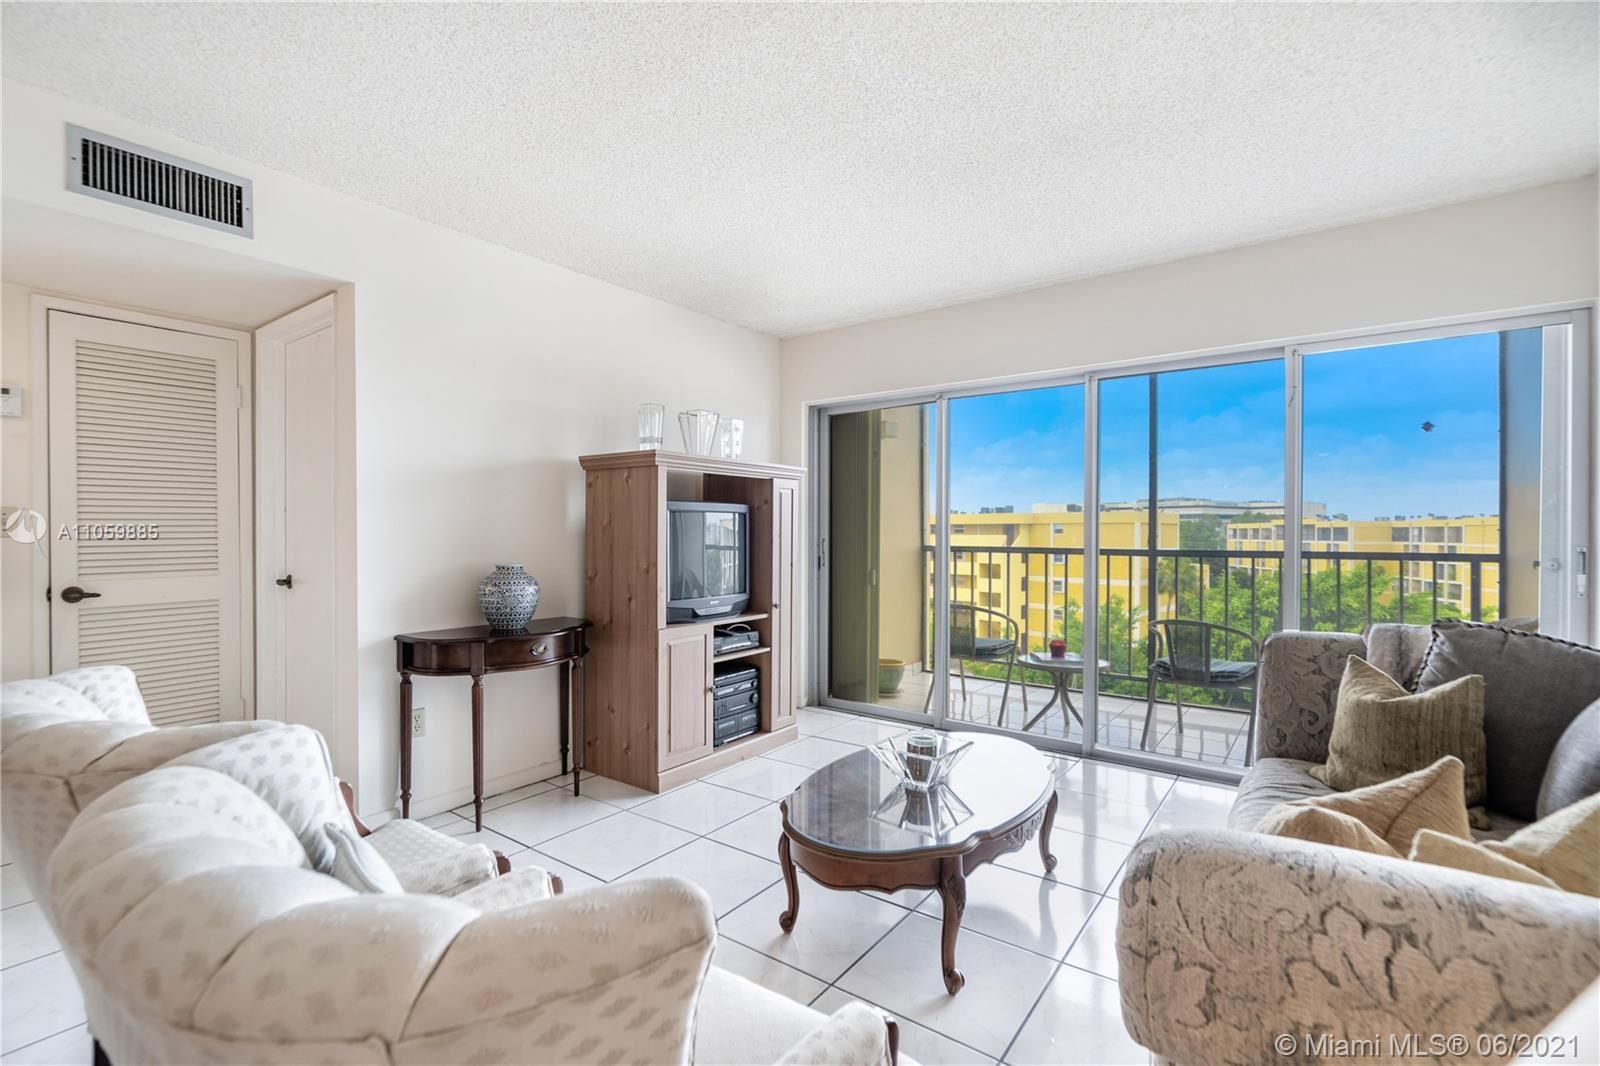 9120 Fontainebleau Blvd #503, Miami, FL 33172 - #: A11059885